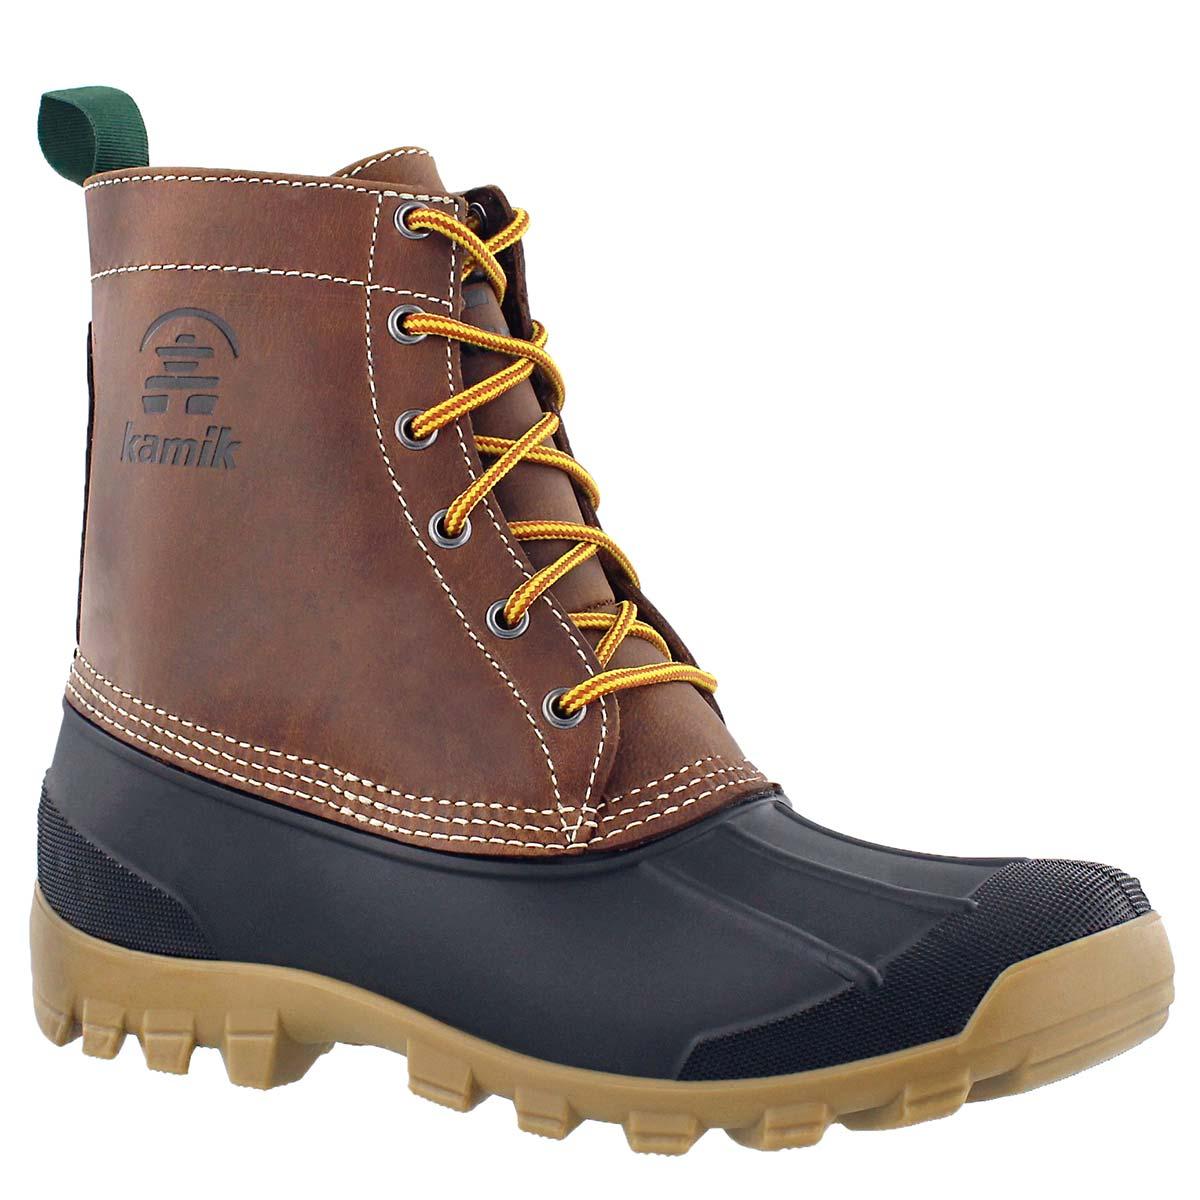 Mns Yukon6 dk brown wtrprf winter boot